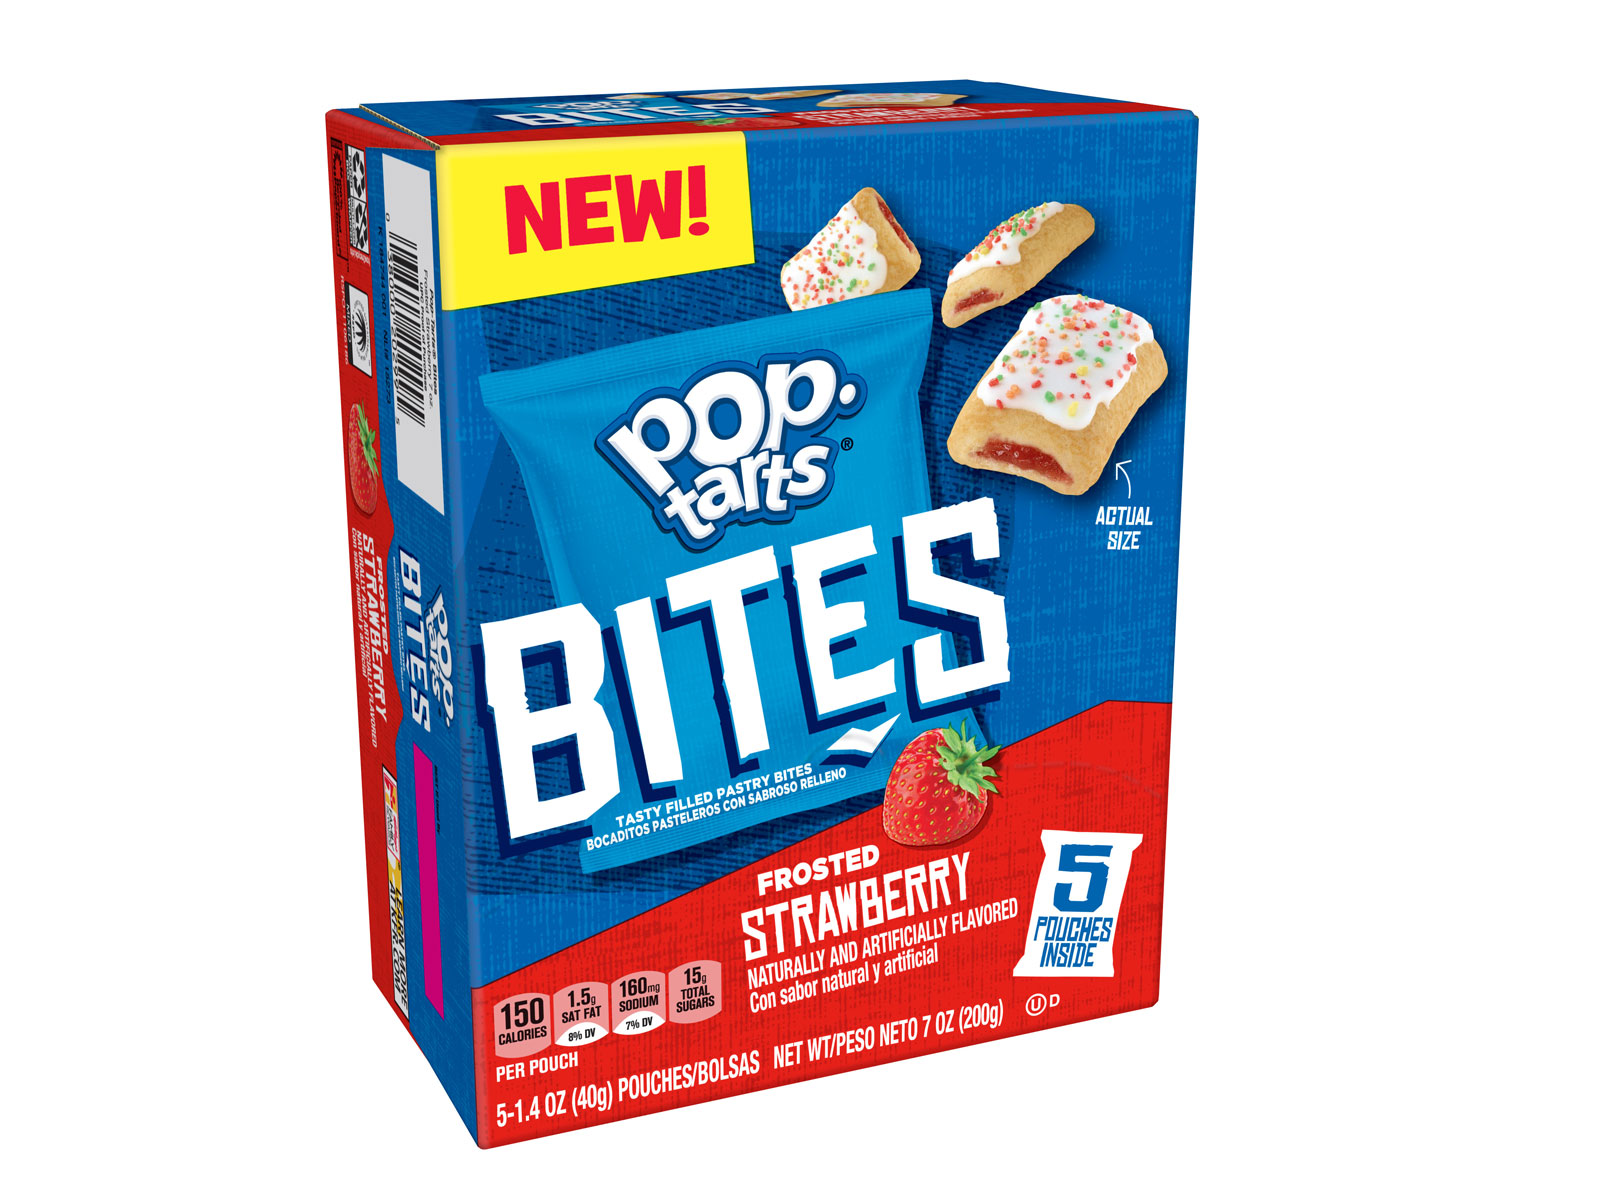 Pop-Tarts Bites Shrink the Toaster Pasty into a Tiny Snack